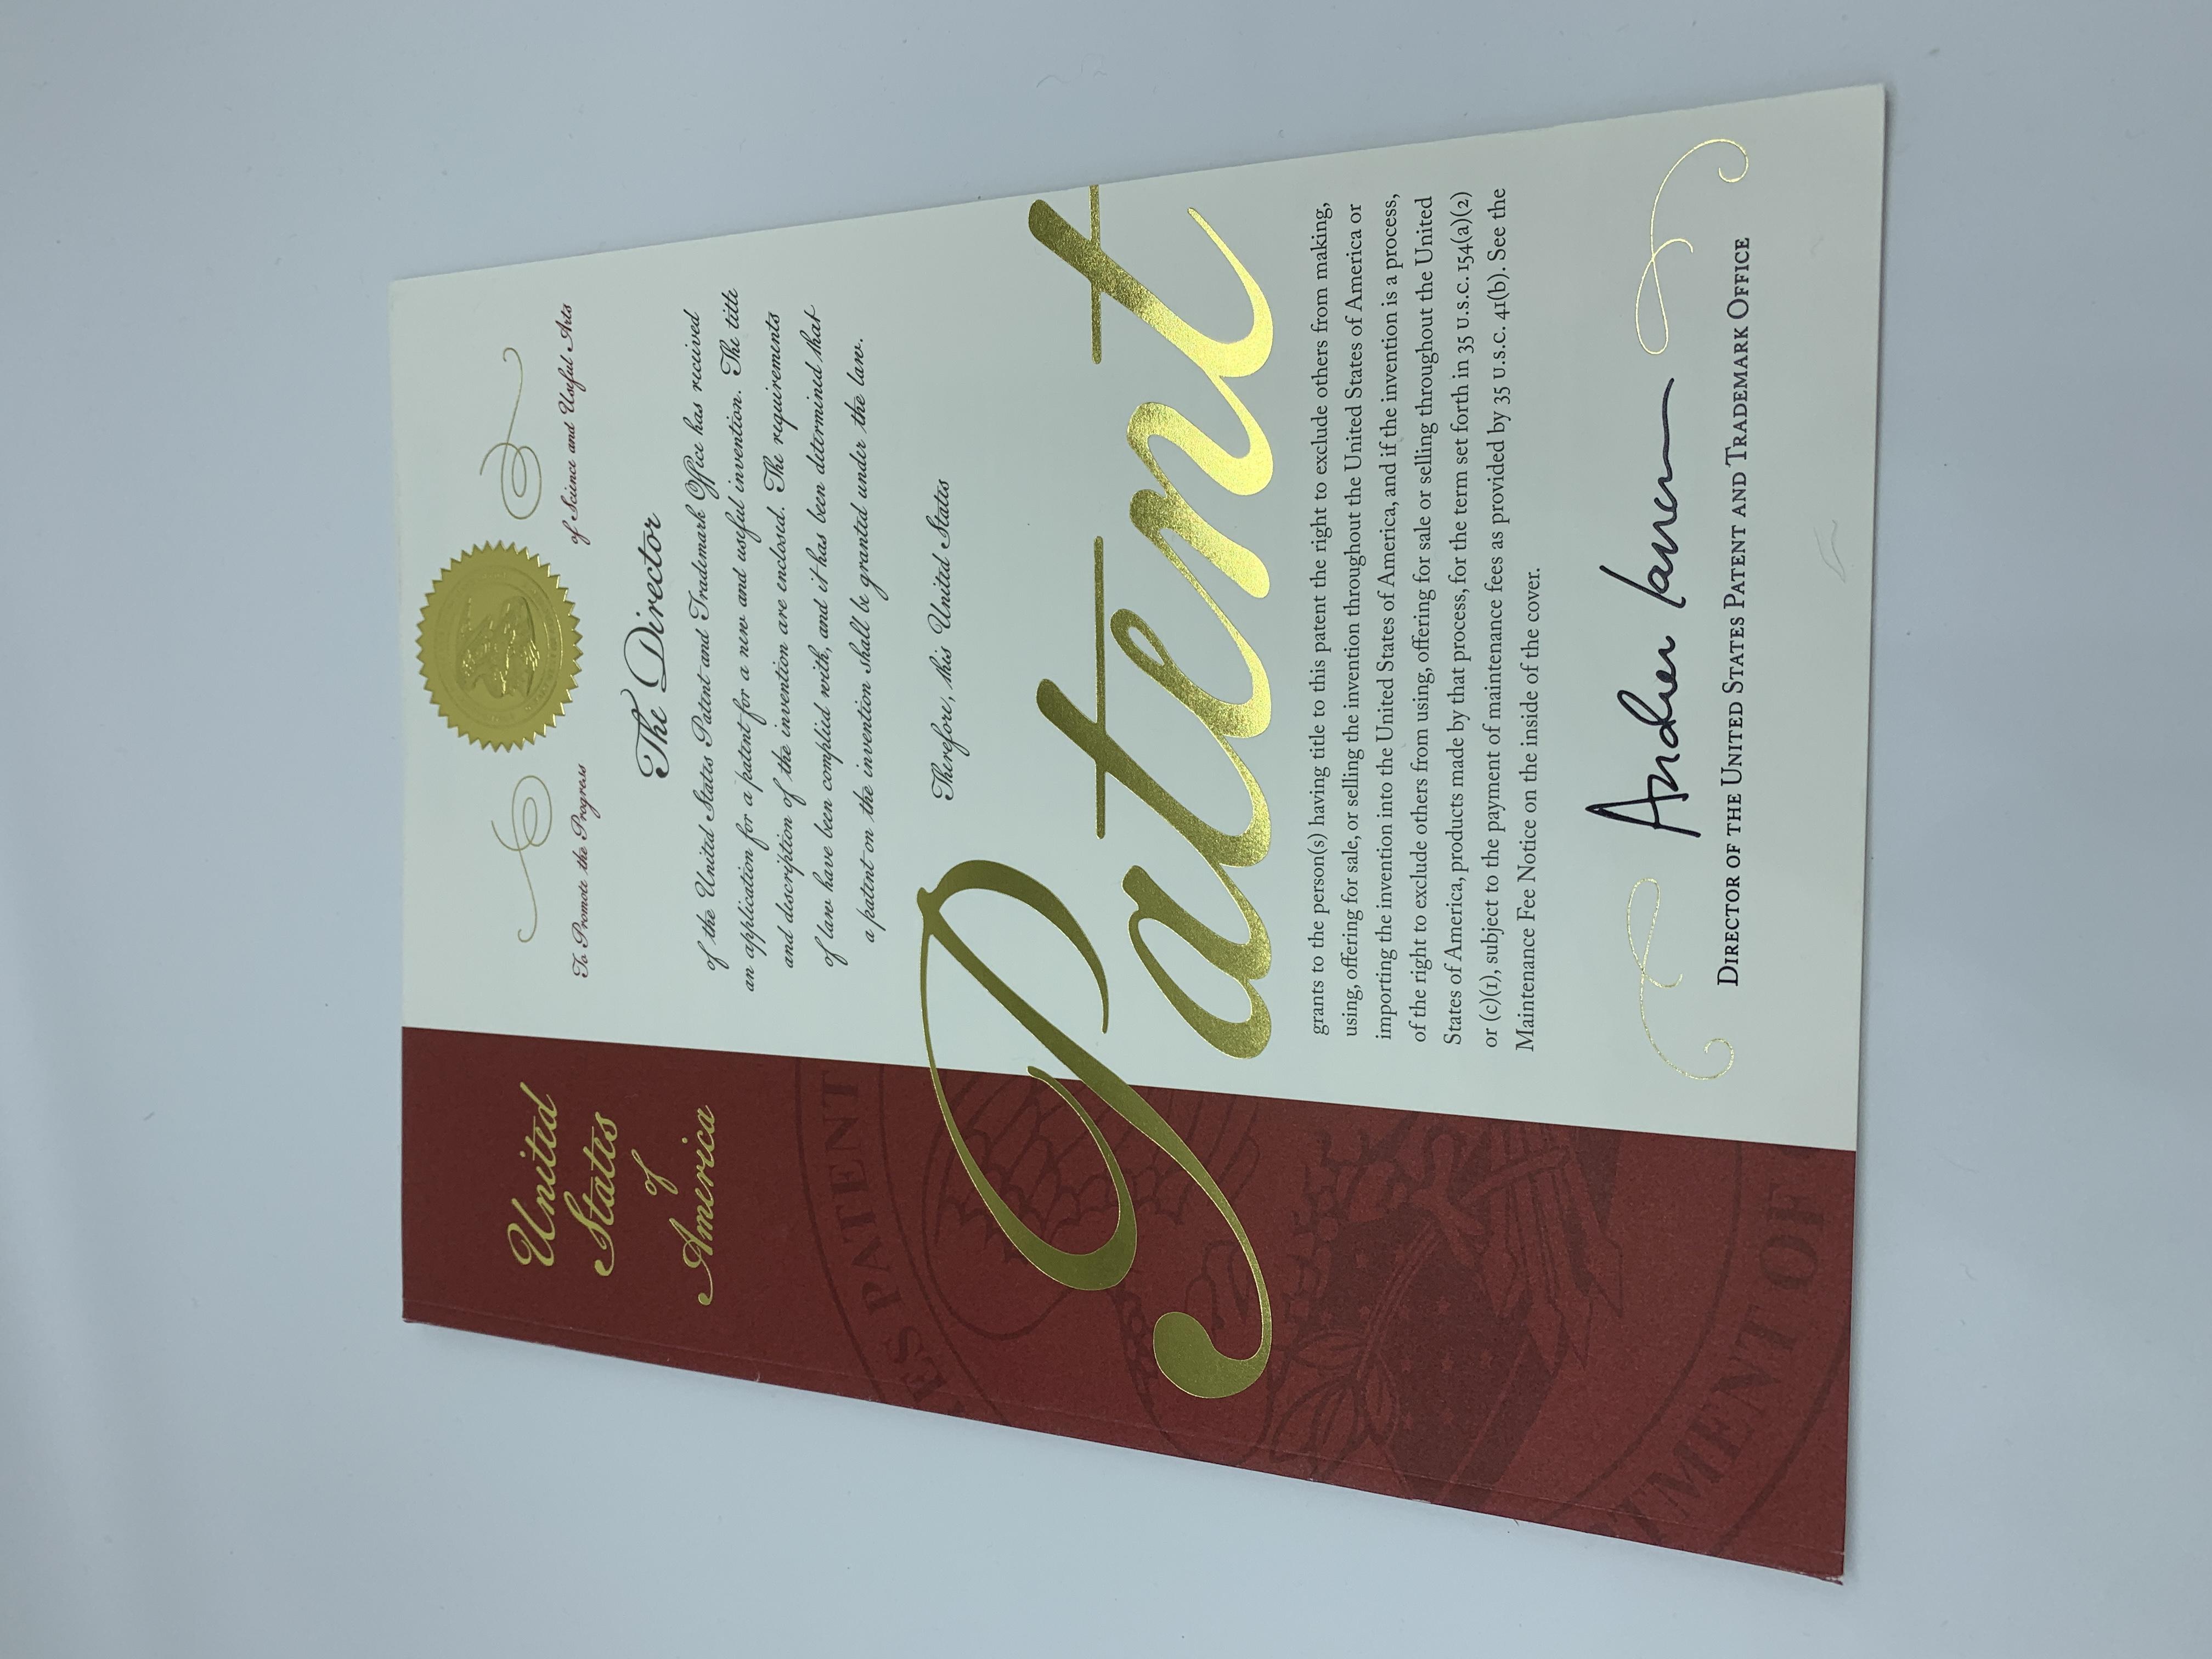 patent-book-uspto-.jpg